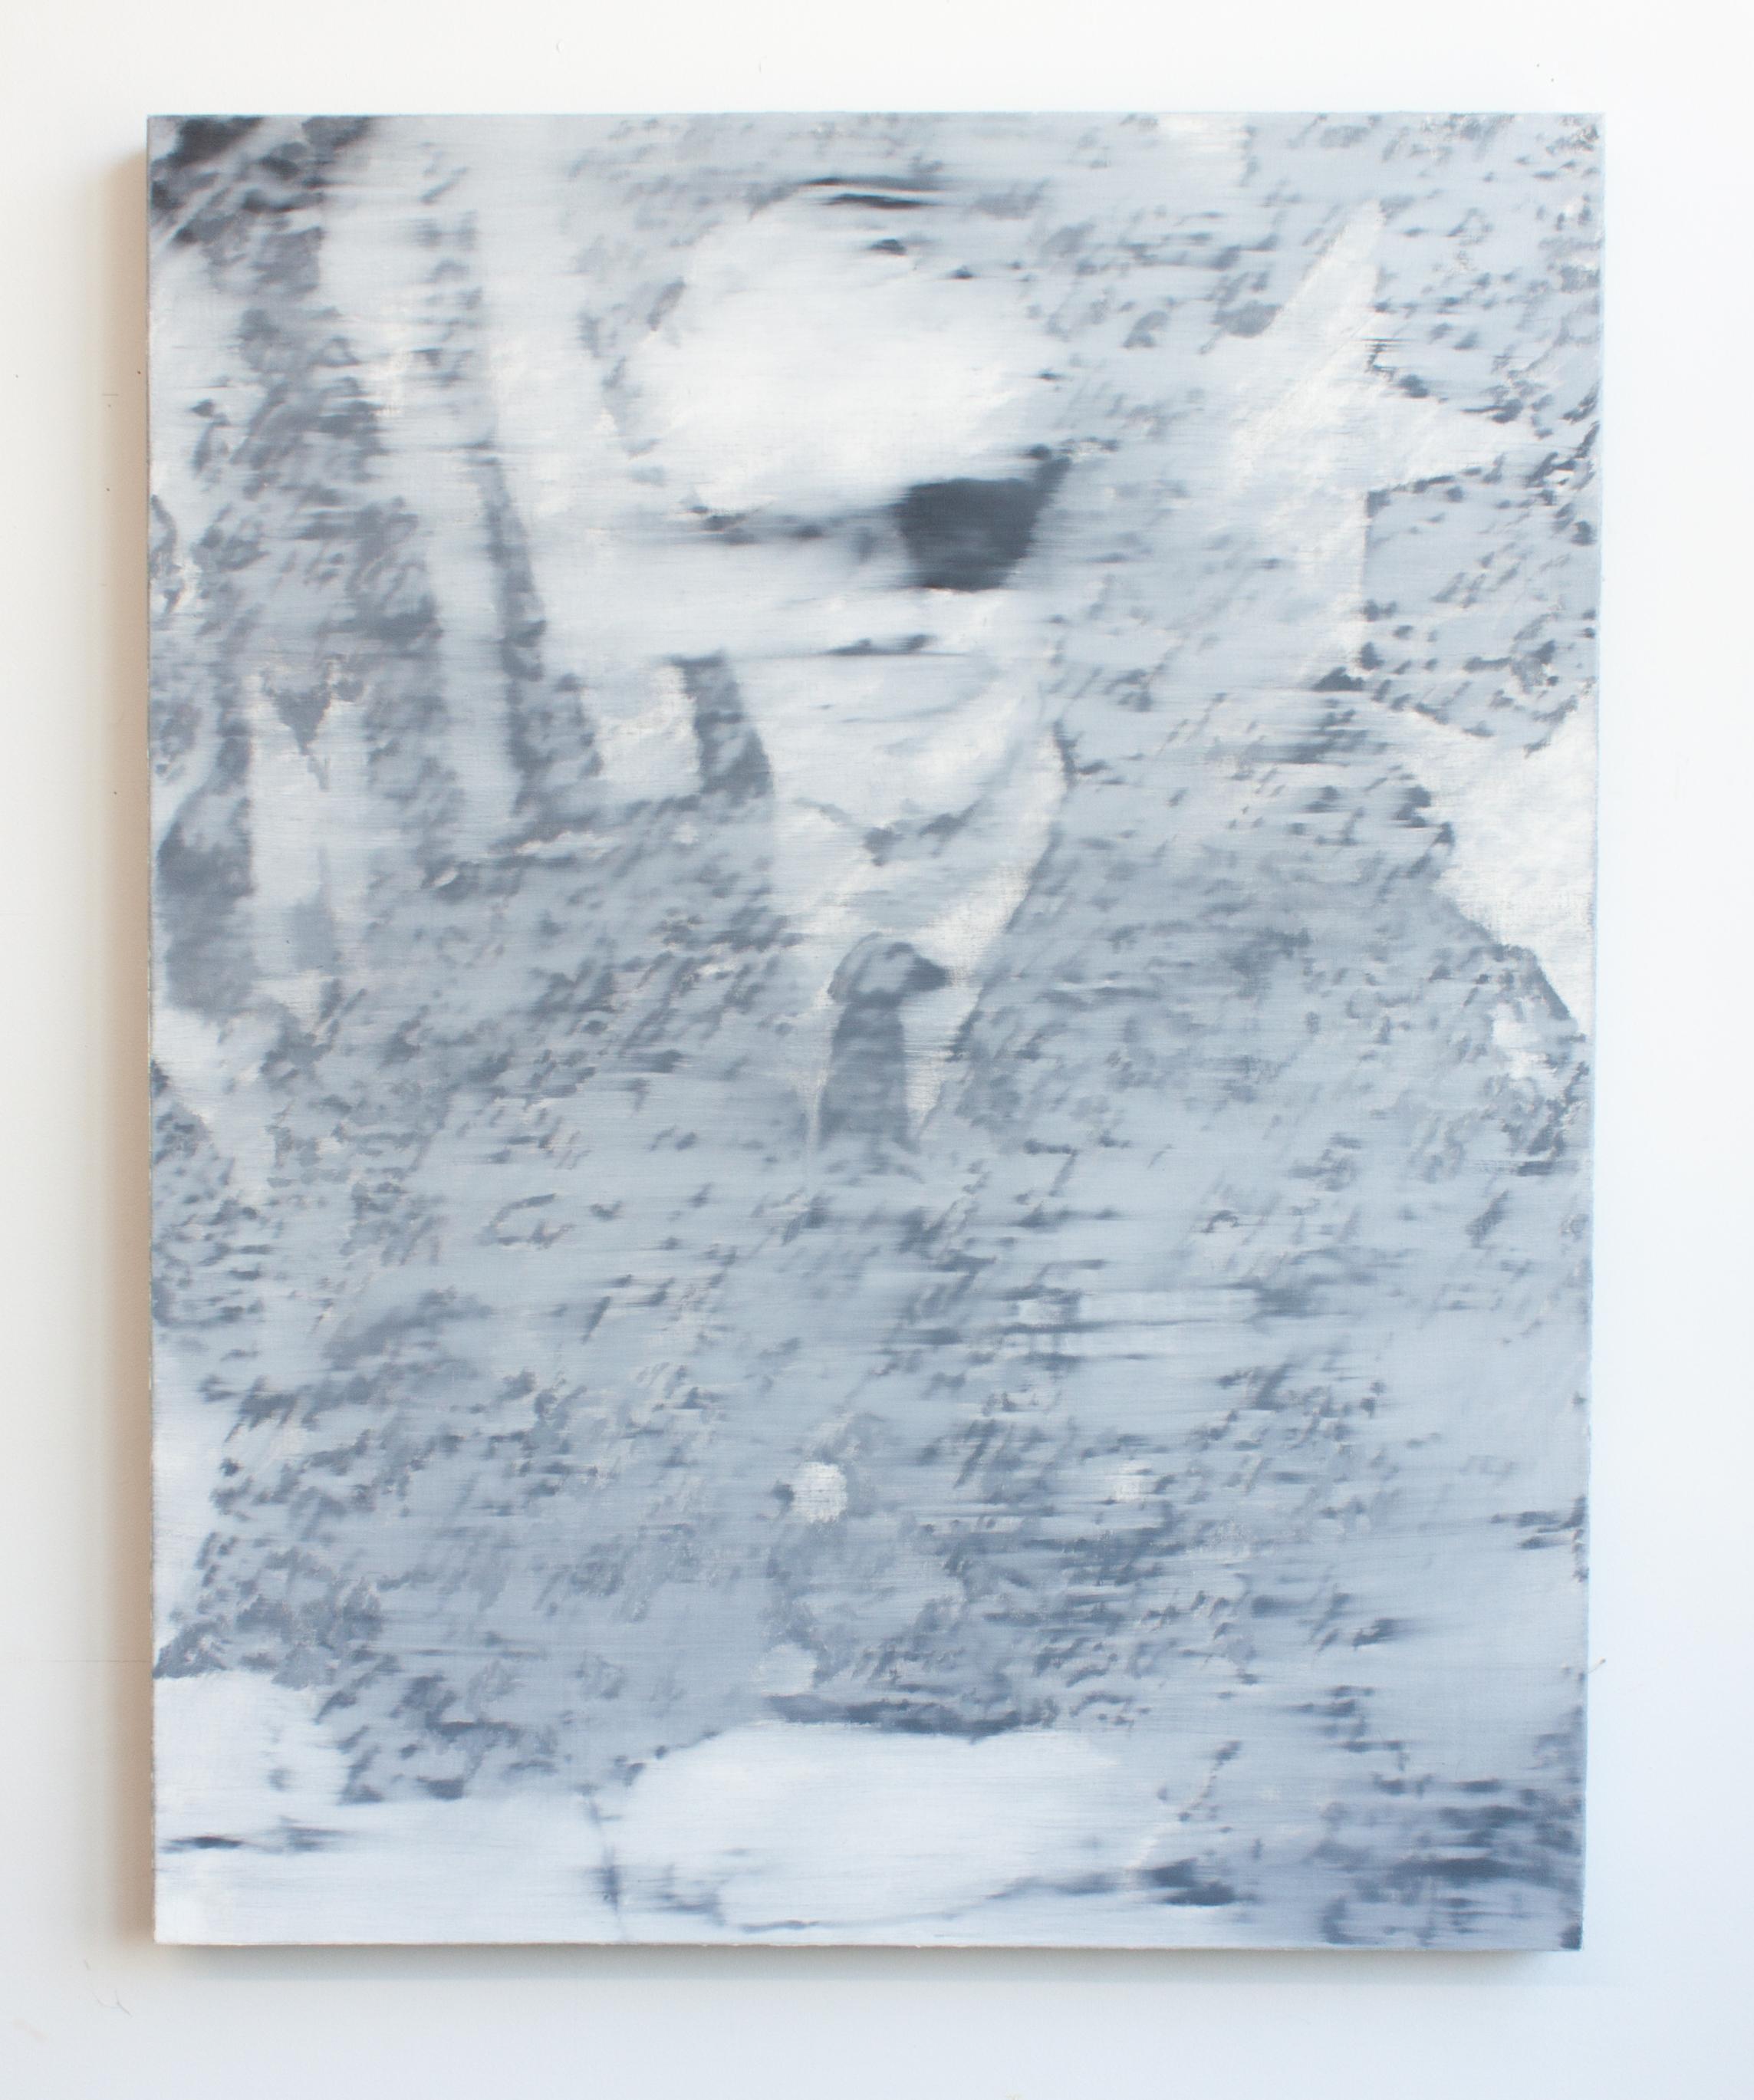 The Man Who Invented North Korea, Charles Hartwell Bonesteel III